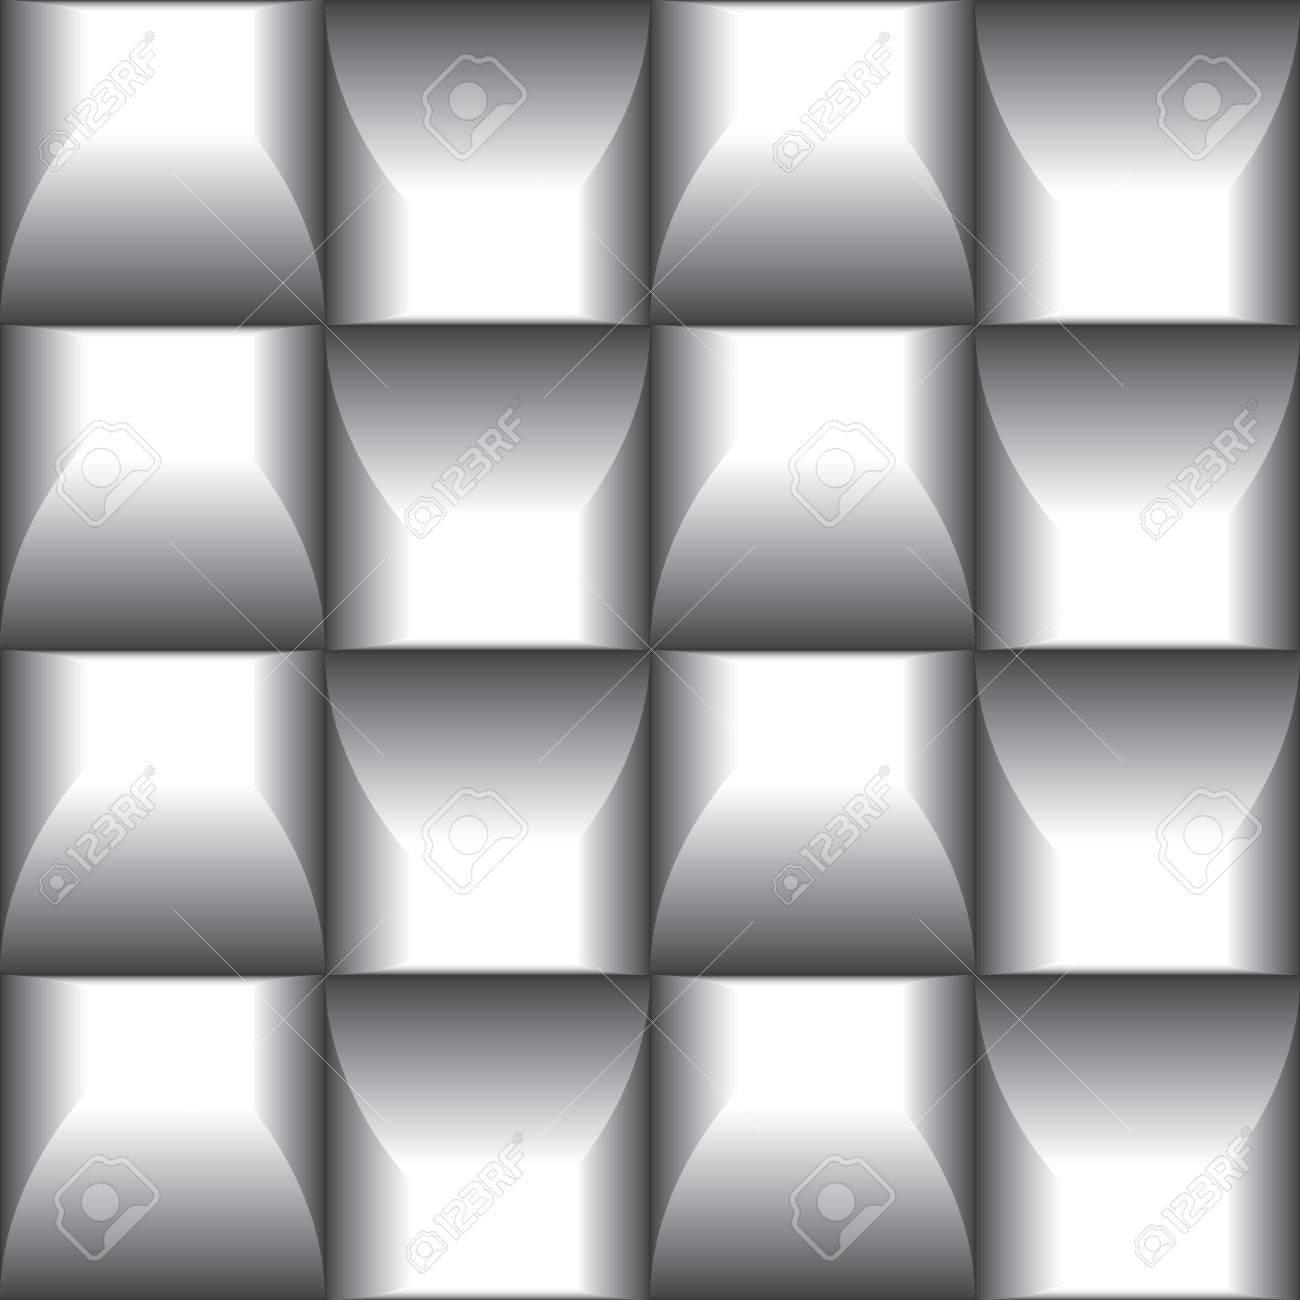 Decorative Paneling Pattern Stylish Graphic Texture Vector Black White Seamless Patterns Interior